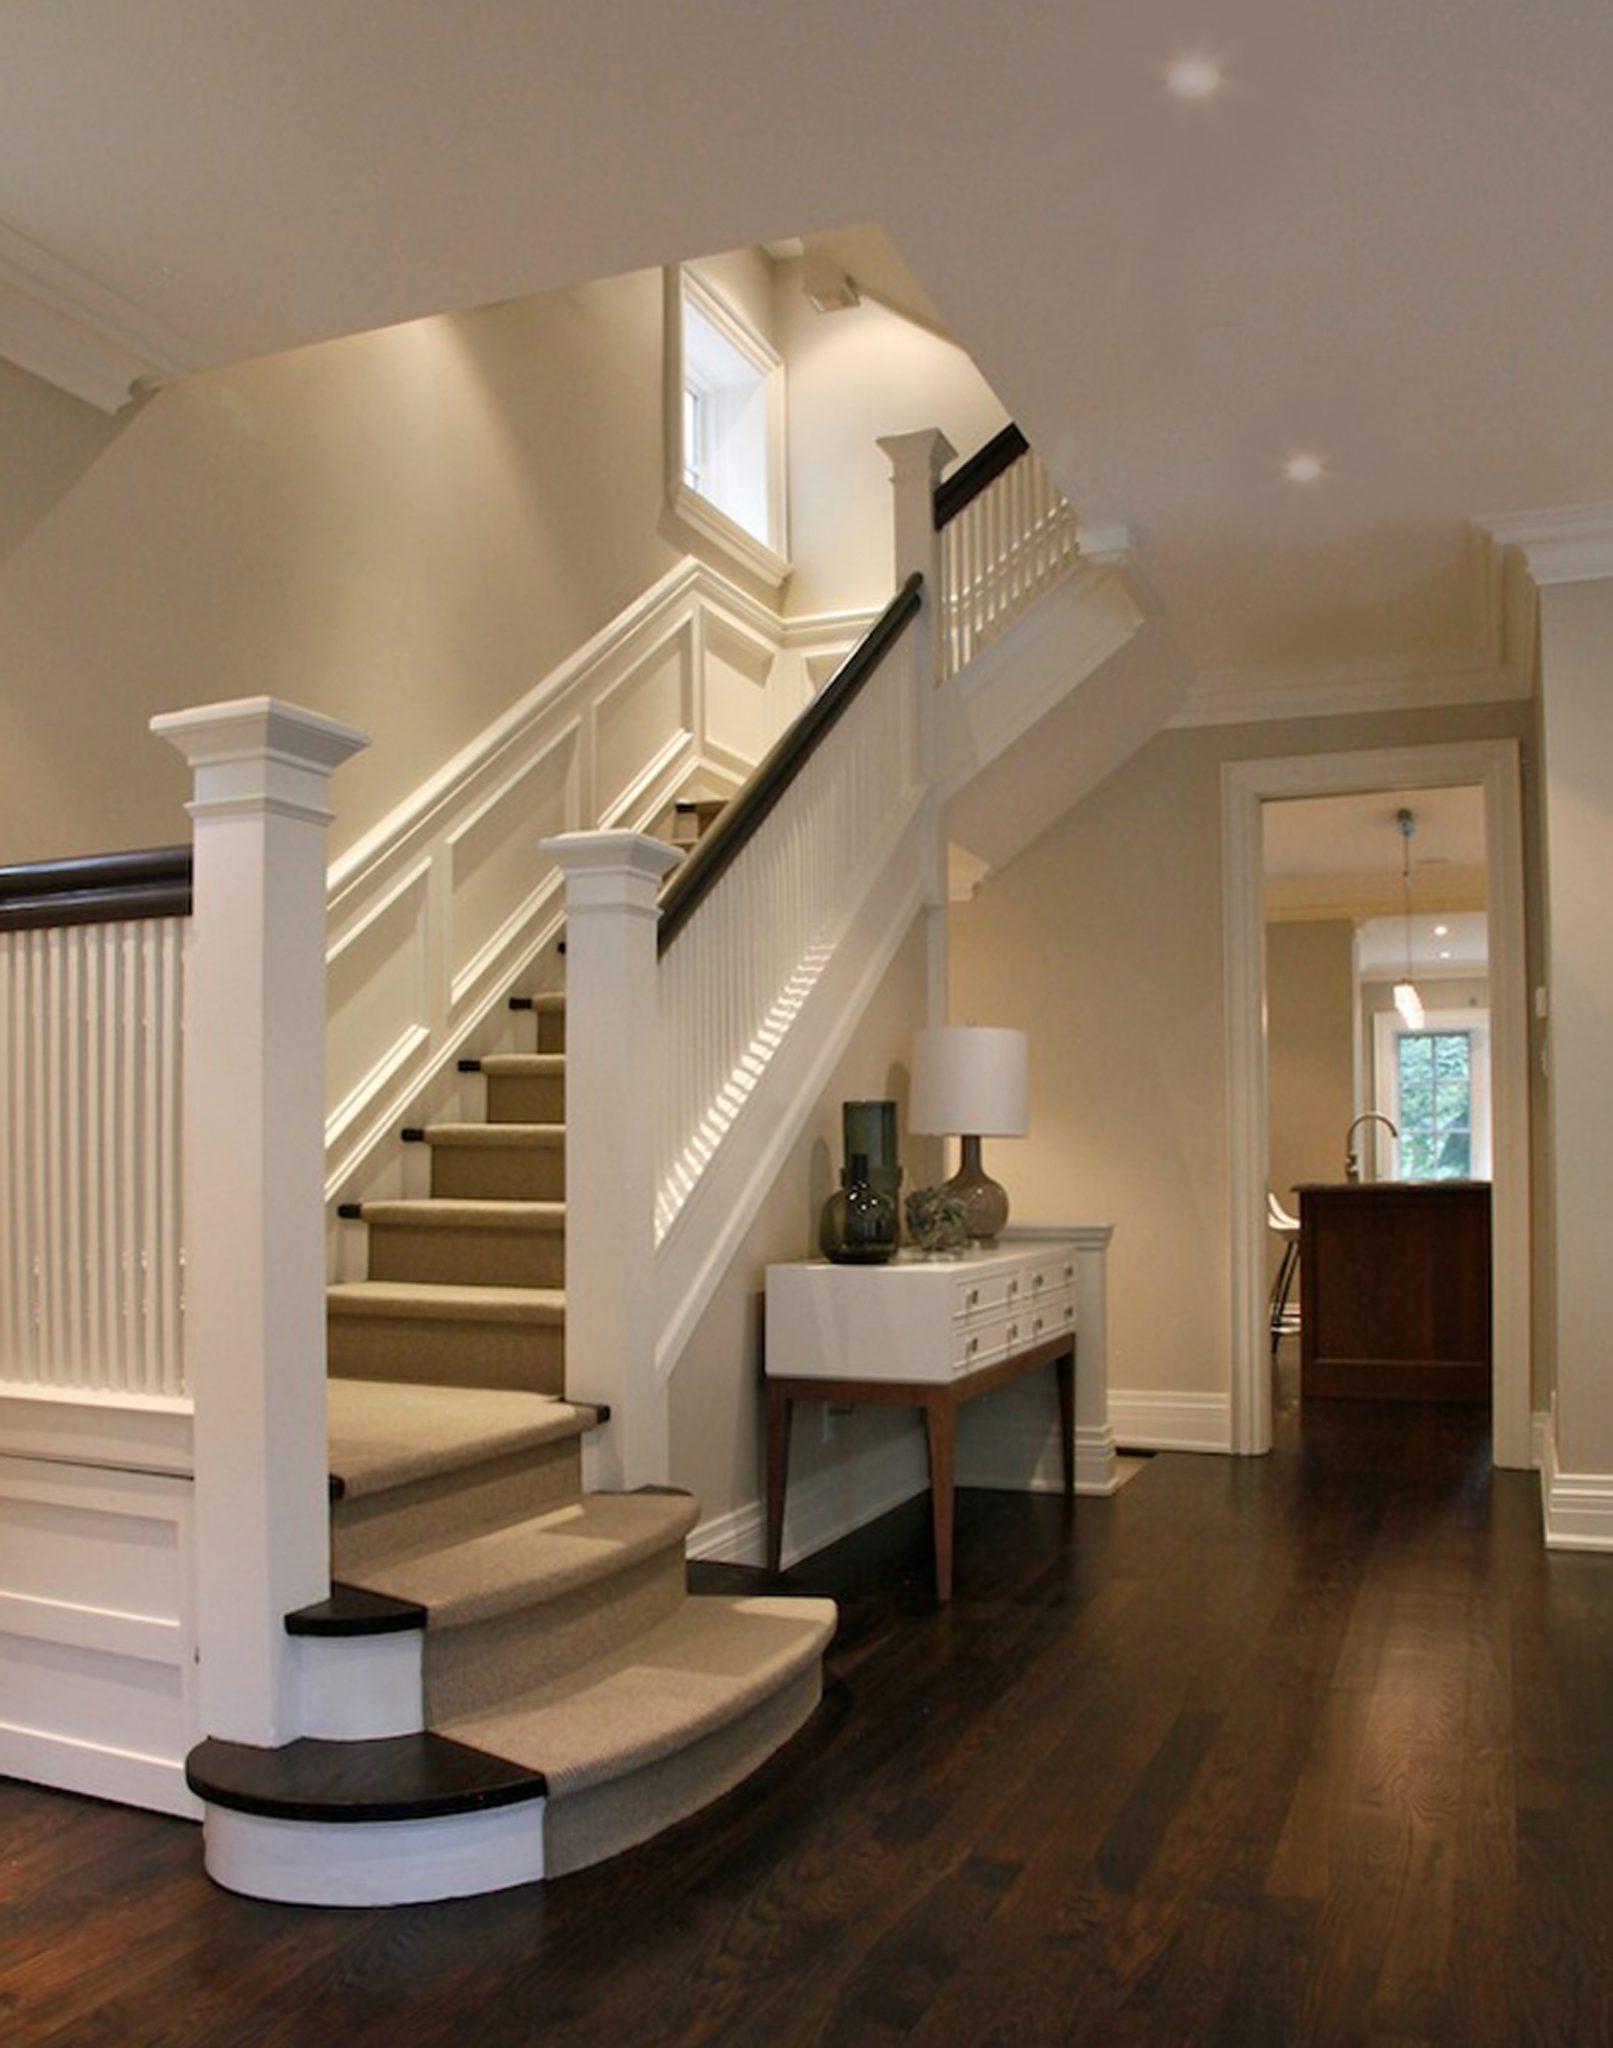 1564 - Hallway